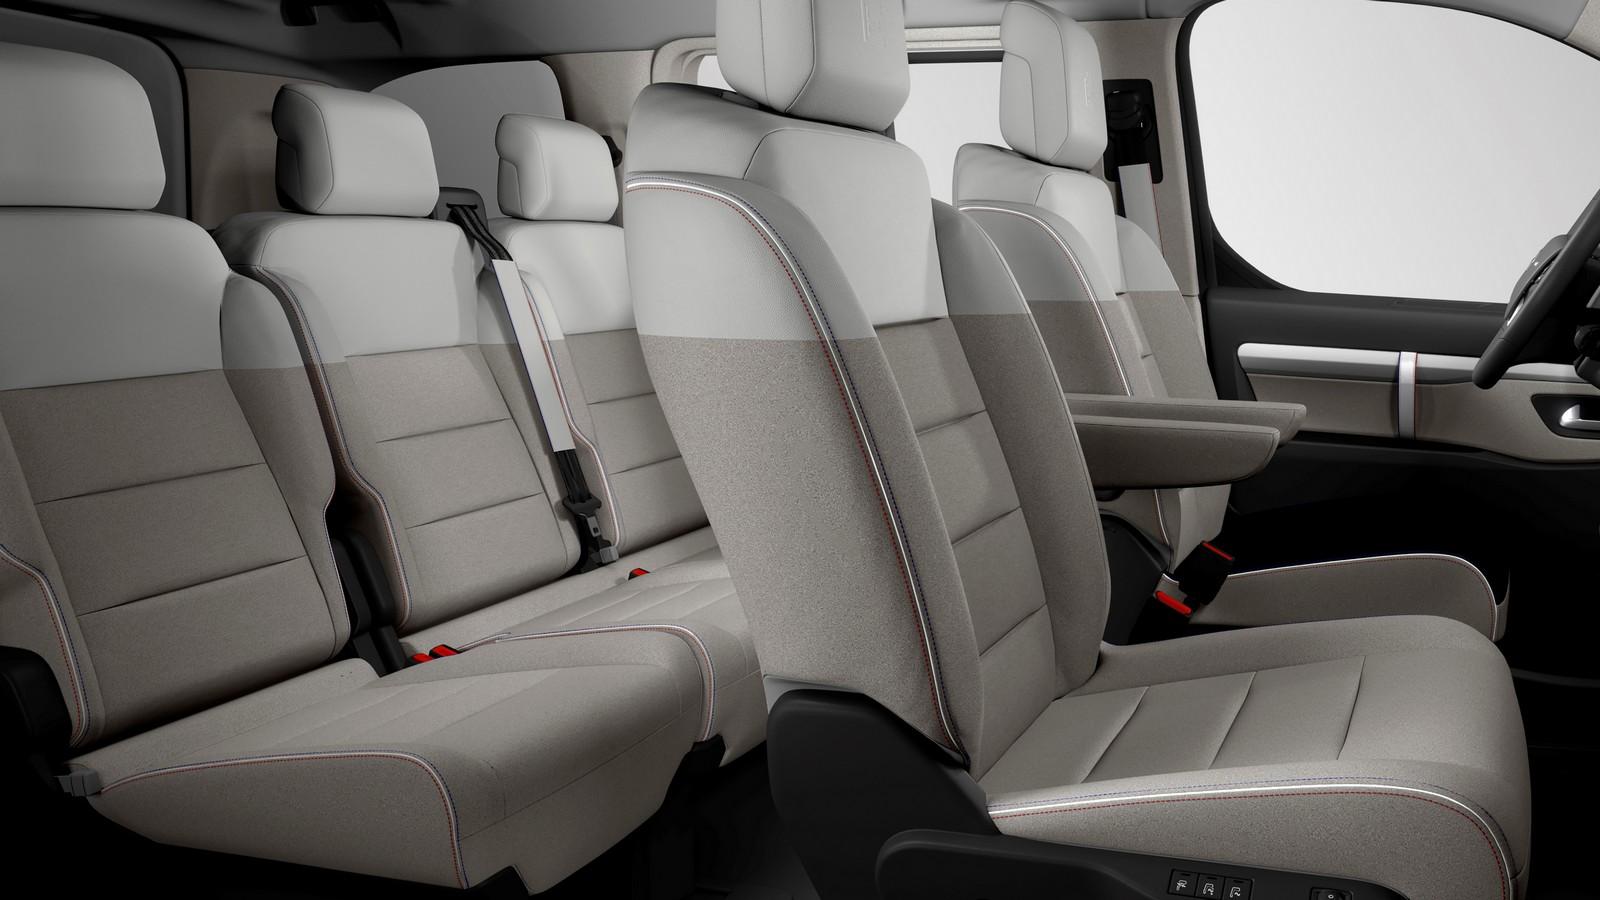 Компания Ситроен презентует вЖеневе концепт-кар модели SpaceTourer 4X4 Ë Concept